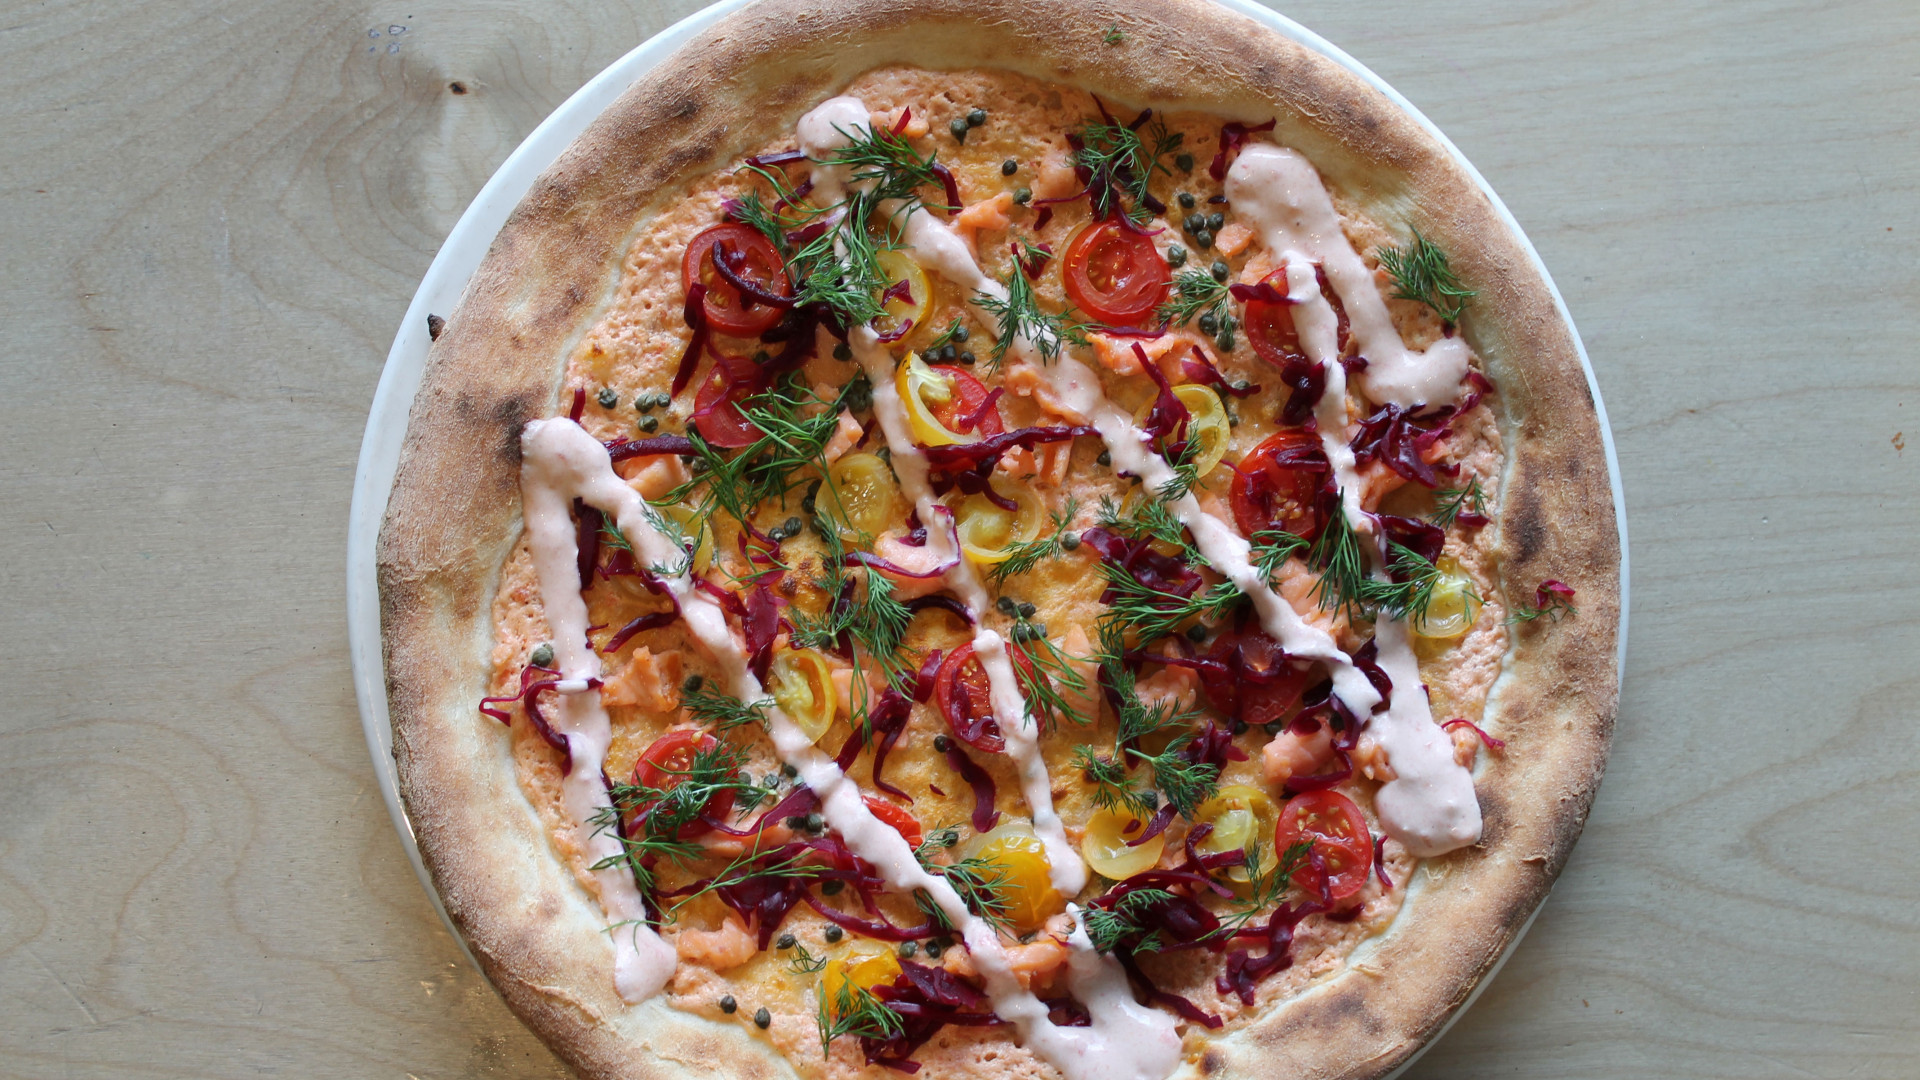 Moxon's Four Hundred Rabbits pizza